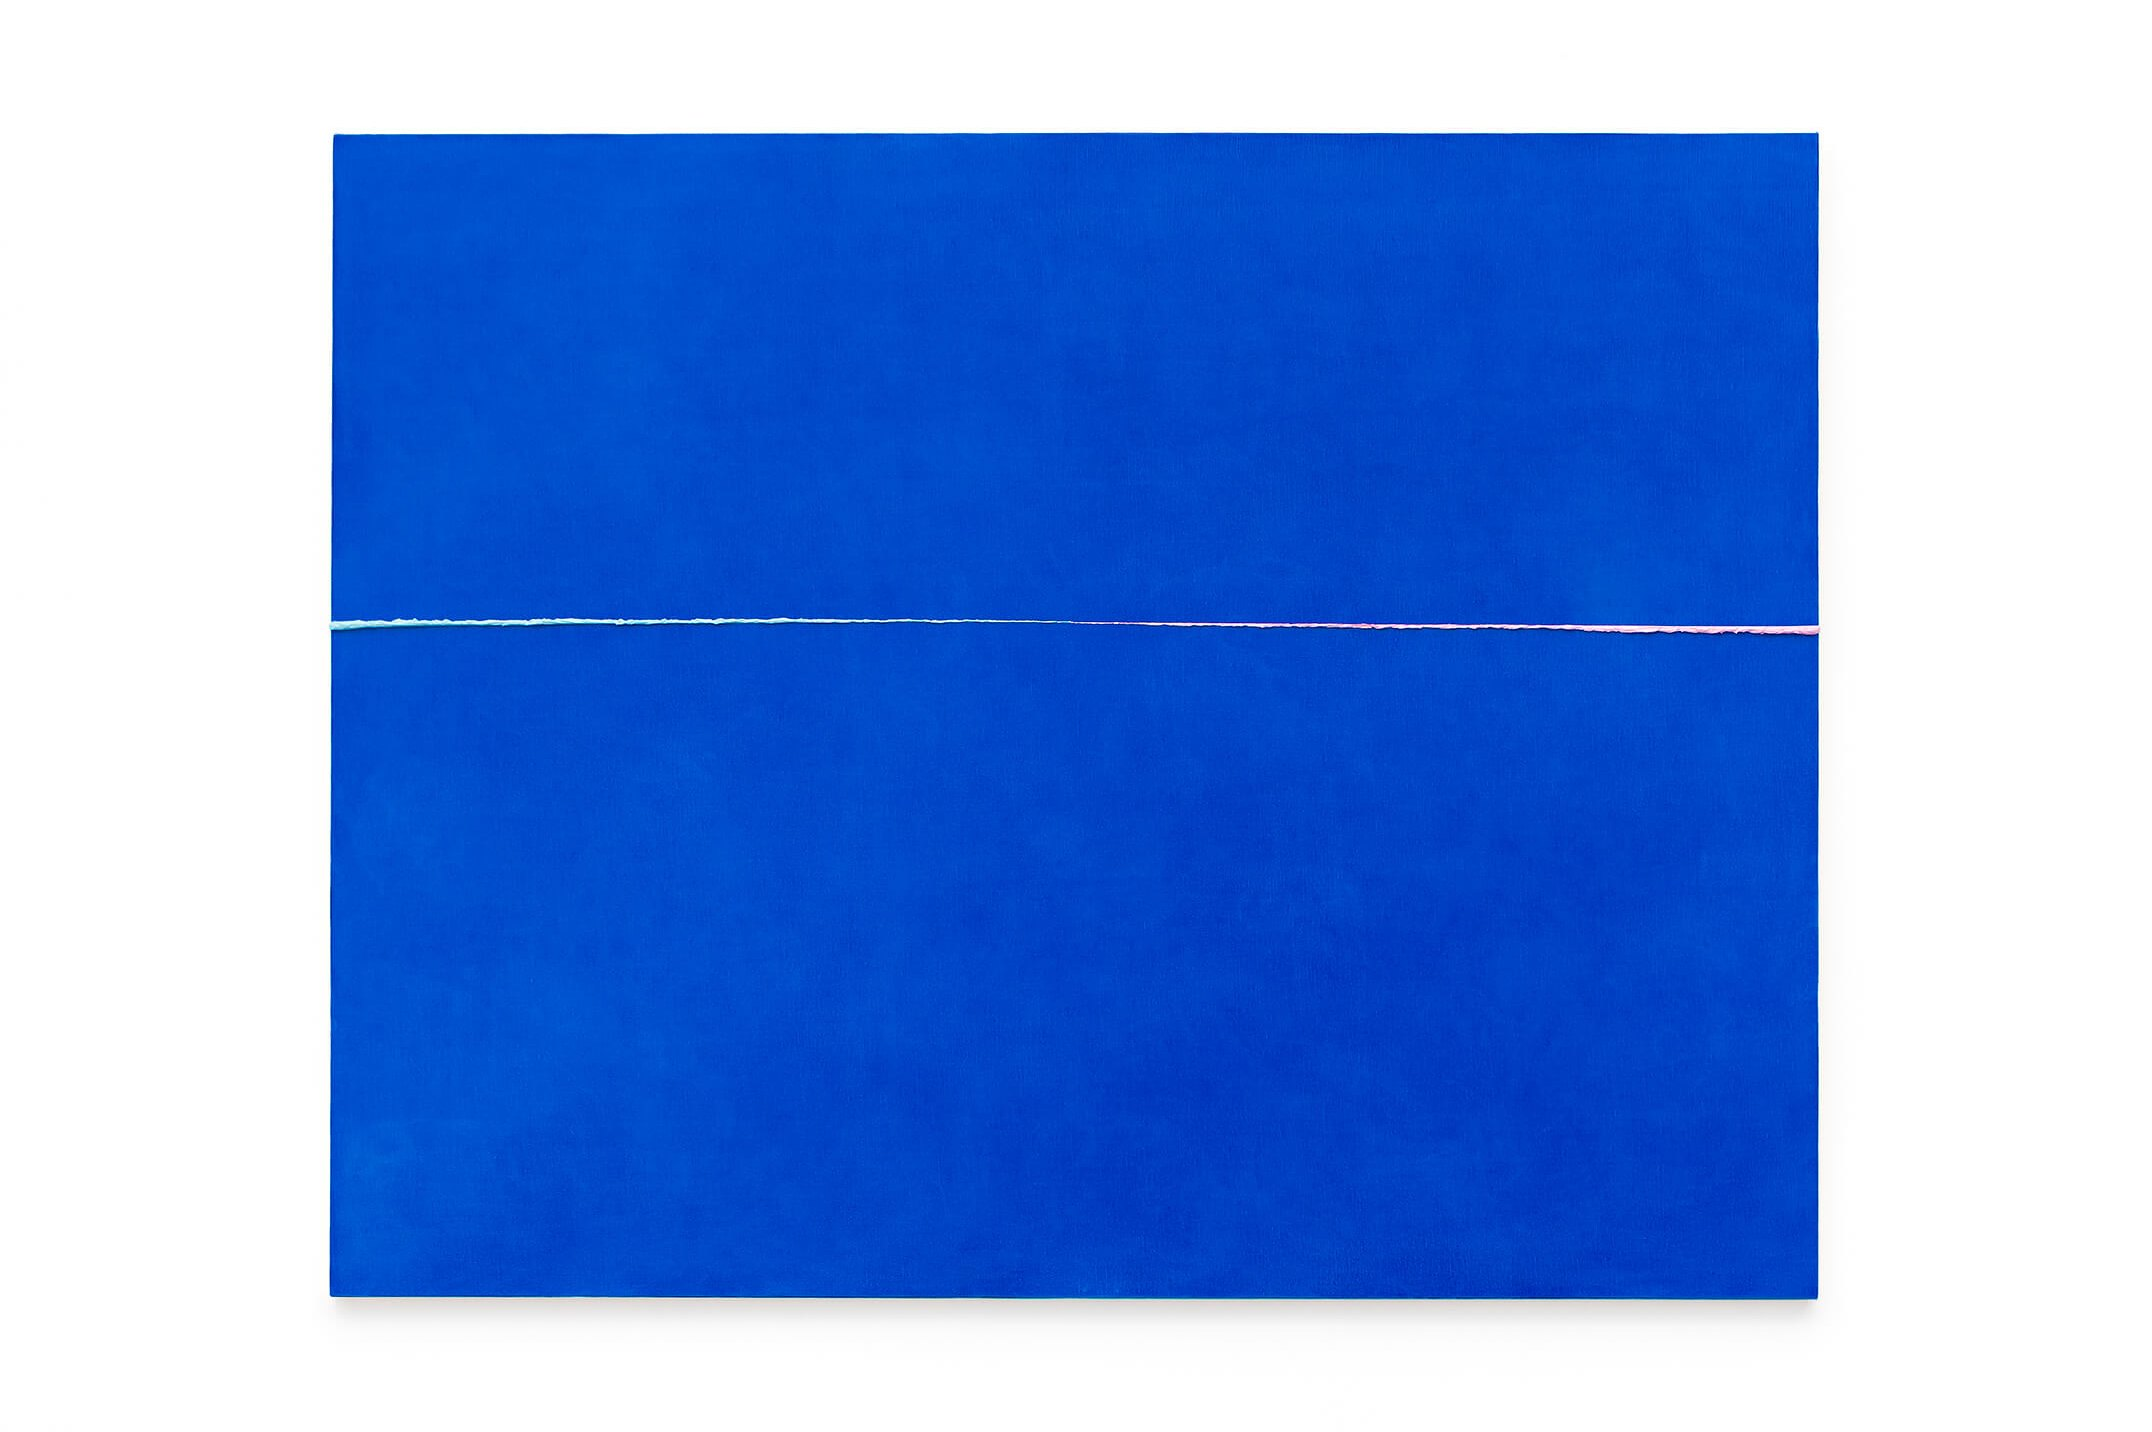 Paulo Monteiro,<em>untitled</em>, 2015, oil on canvas,145 × 185 cm - Mendes Wood DM